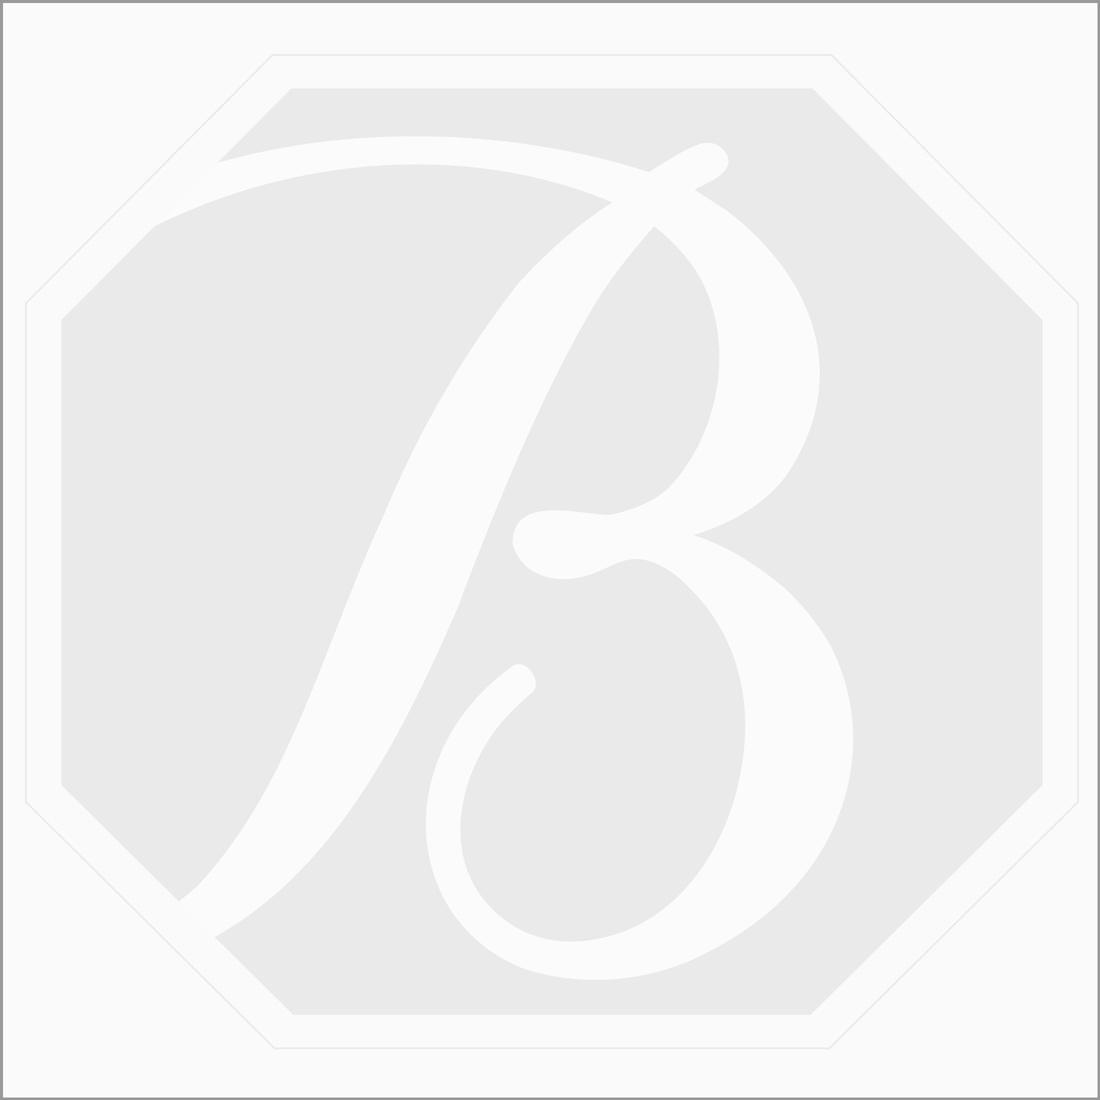 2 Black Diamond Oval Shape Rose Cut Diamonds - 0.94 cts. (DRC1227)